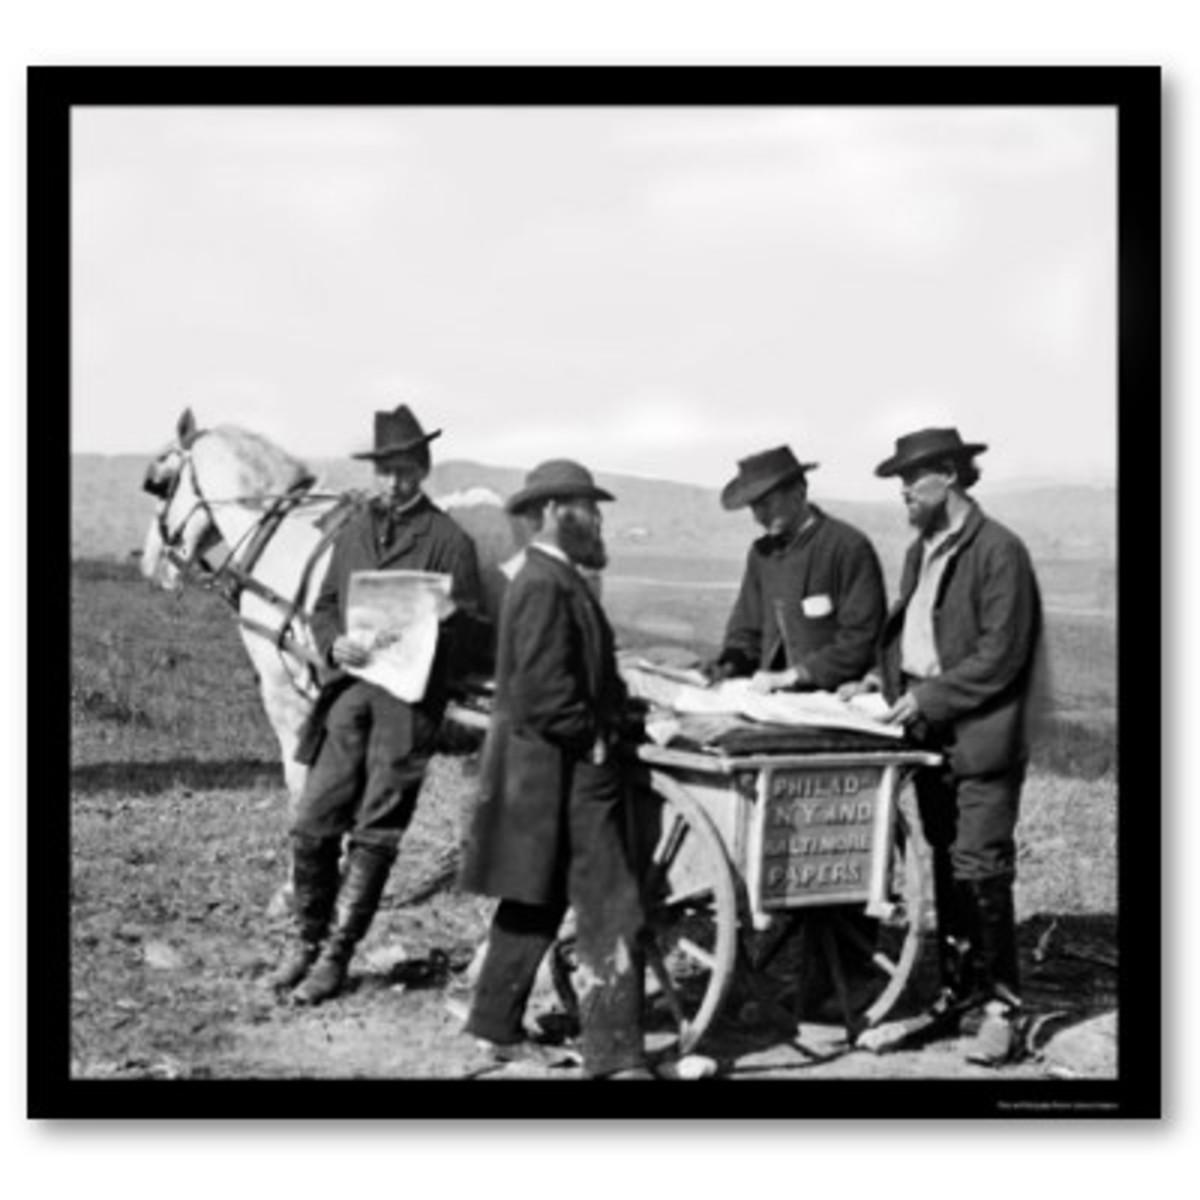 Newspaper deliverymen